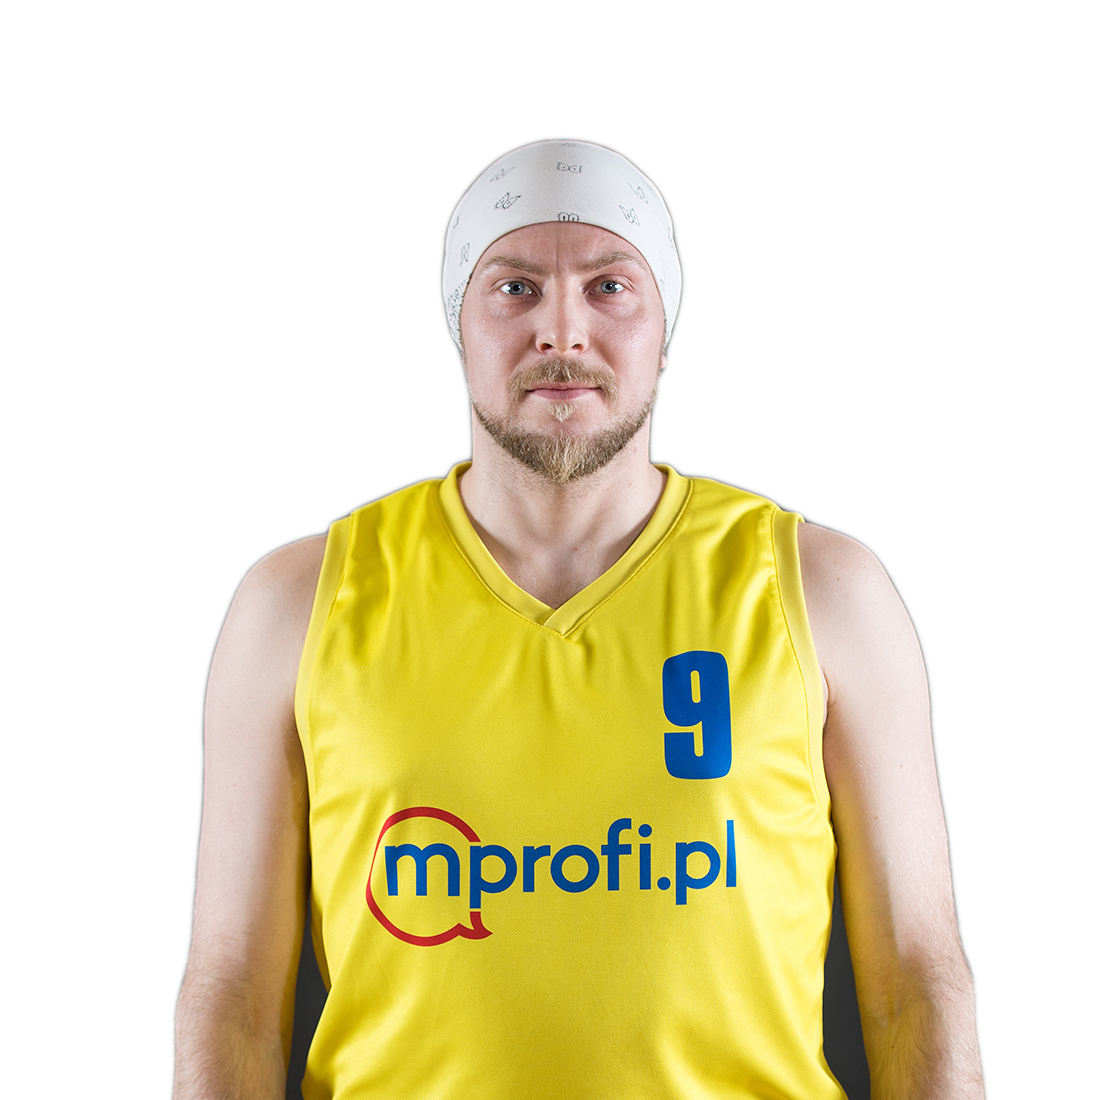 Tomasz Szopa